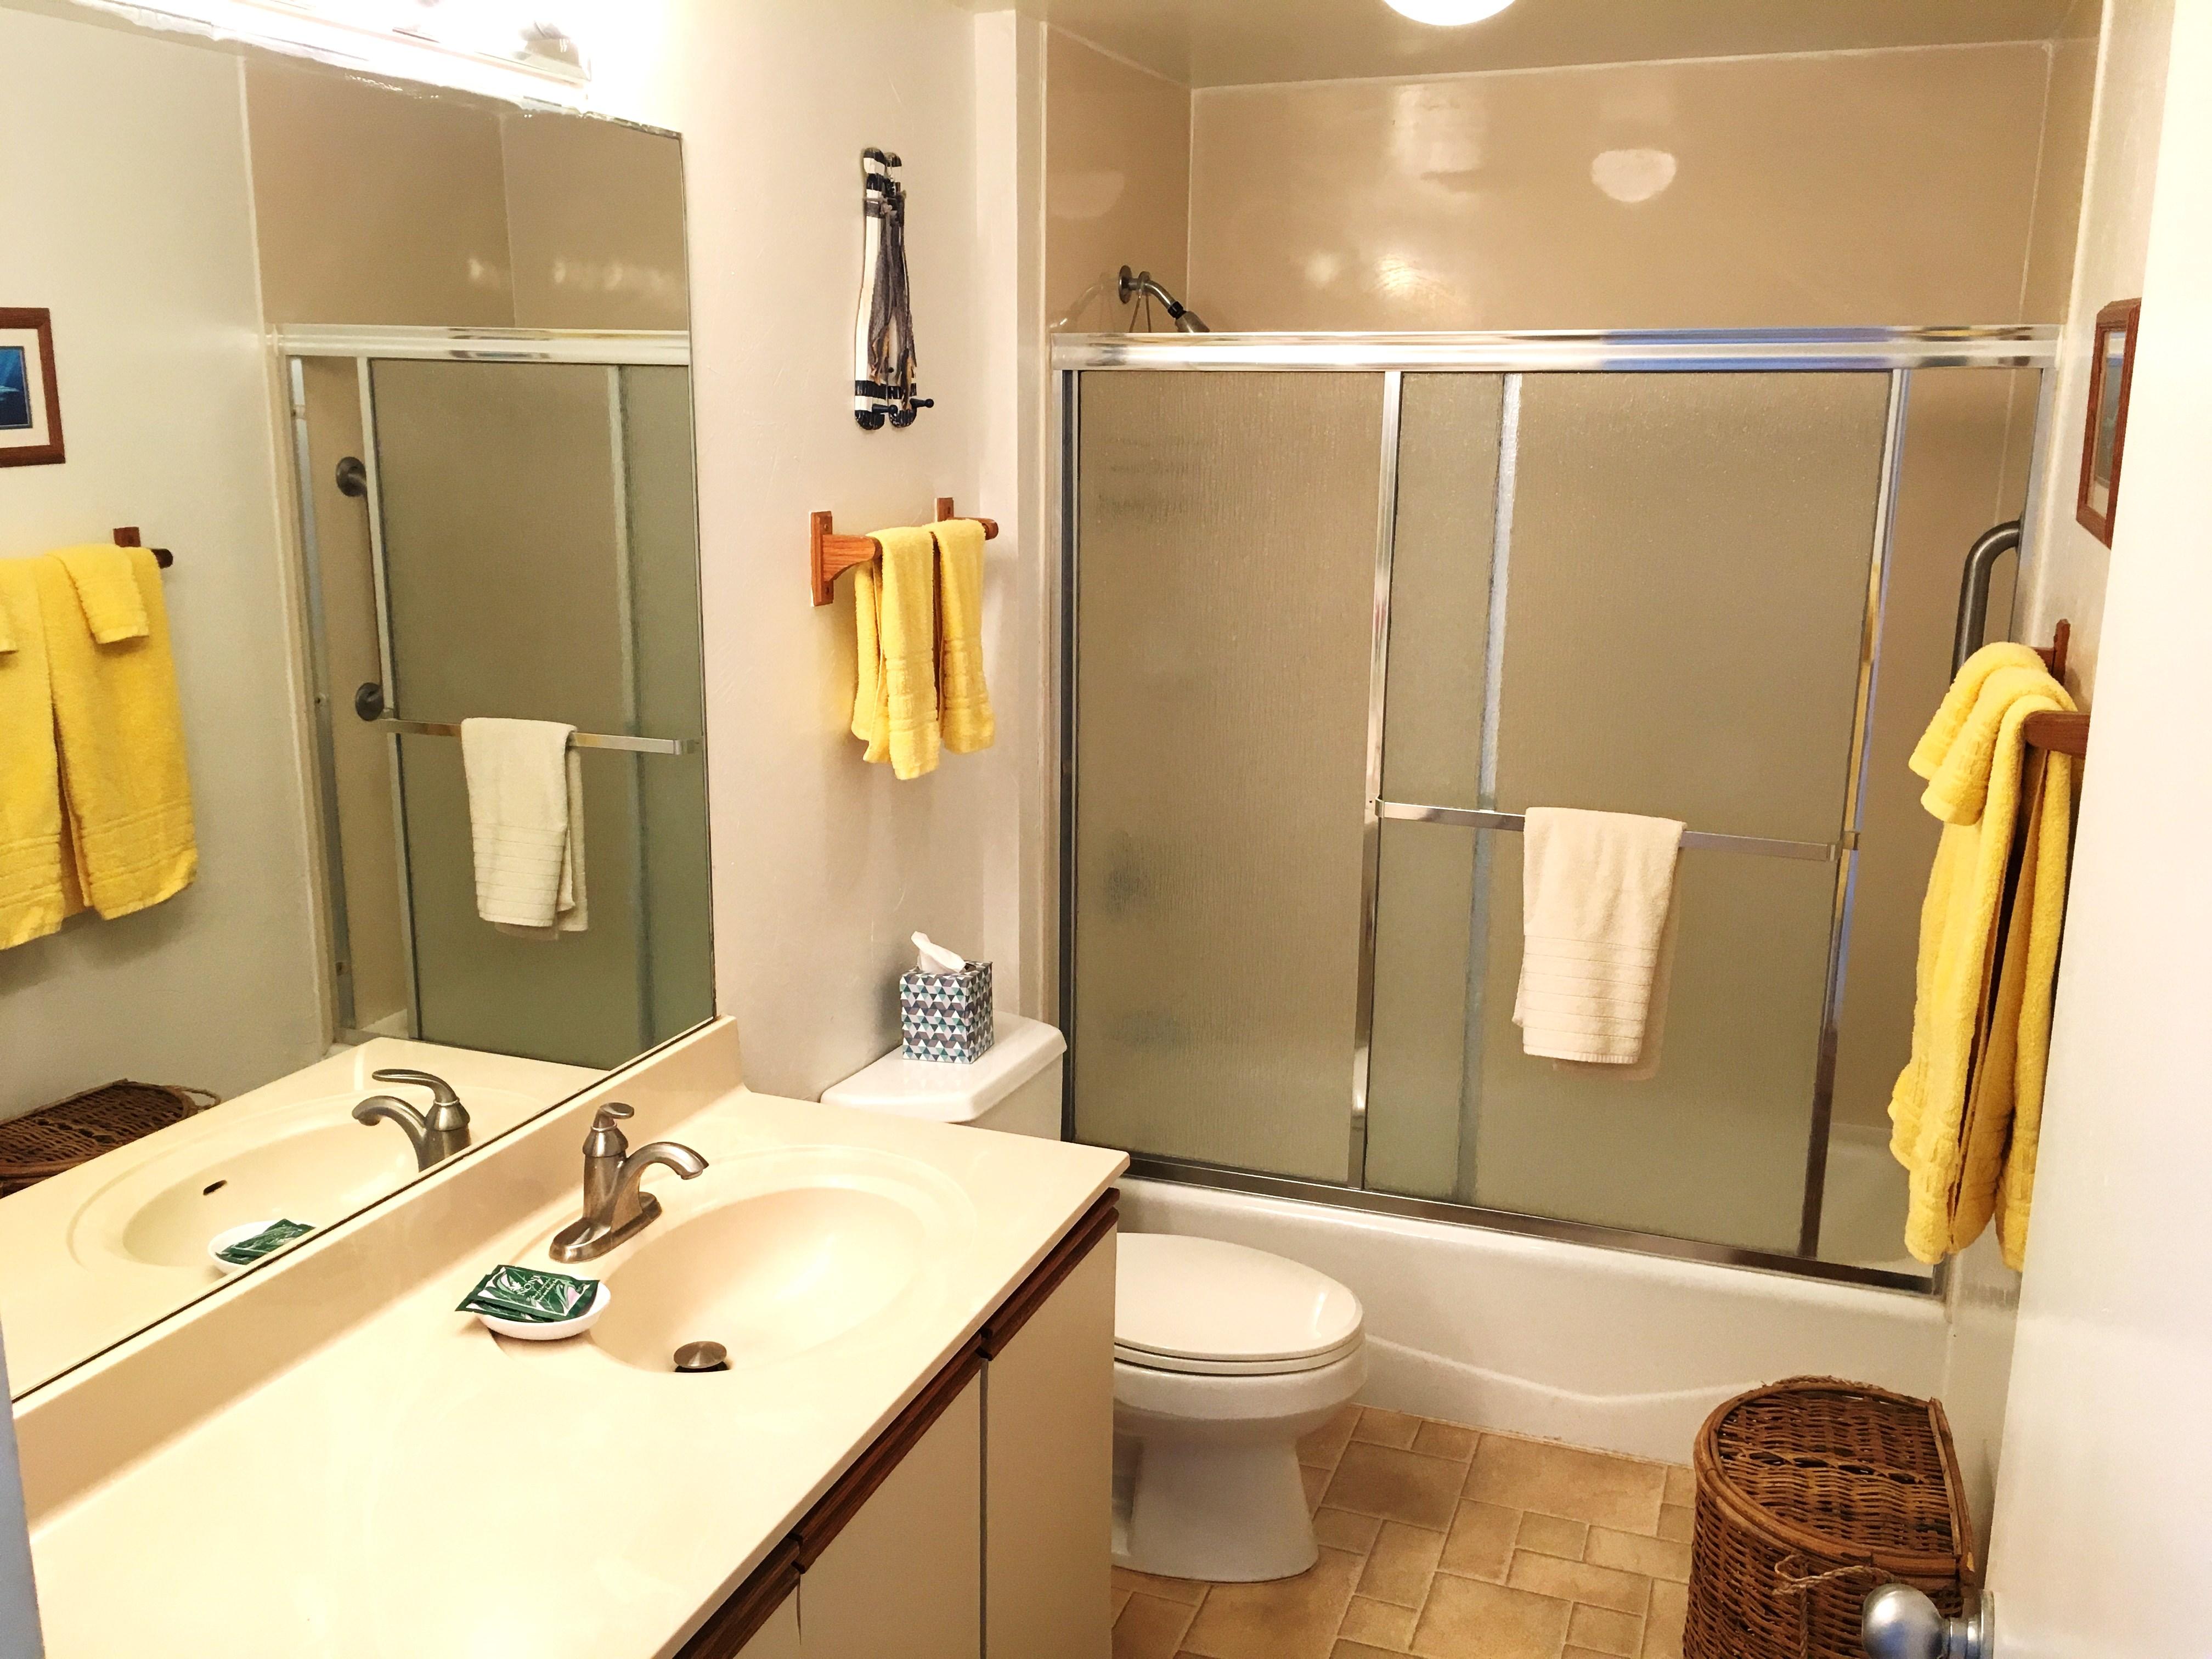 Bathroom at Wailua Bay View 215